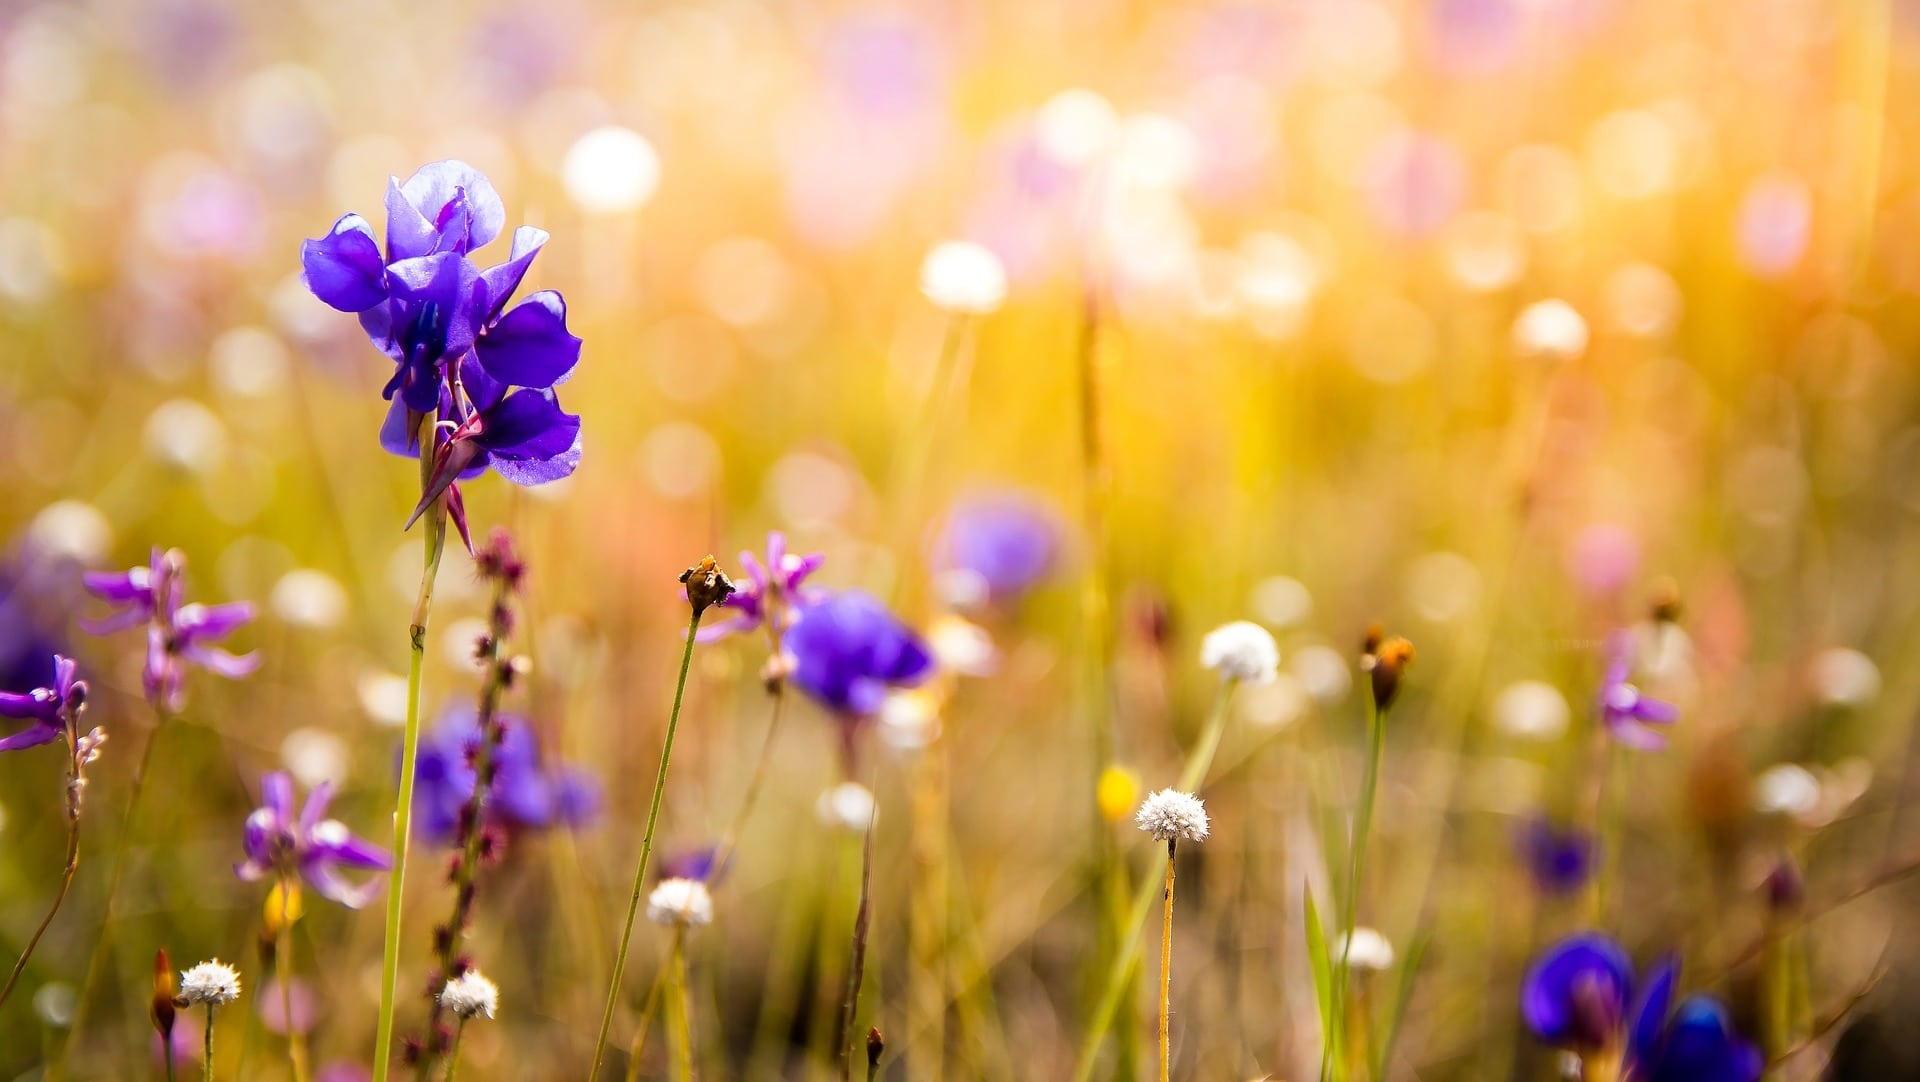 Bei der Wilden Pracht bekommst du Blühpatenschaften